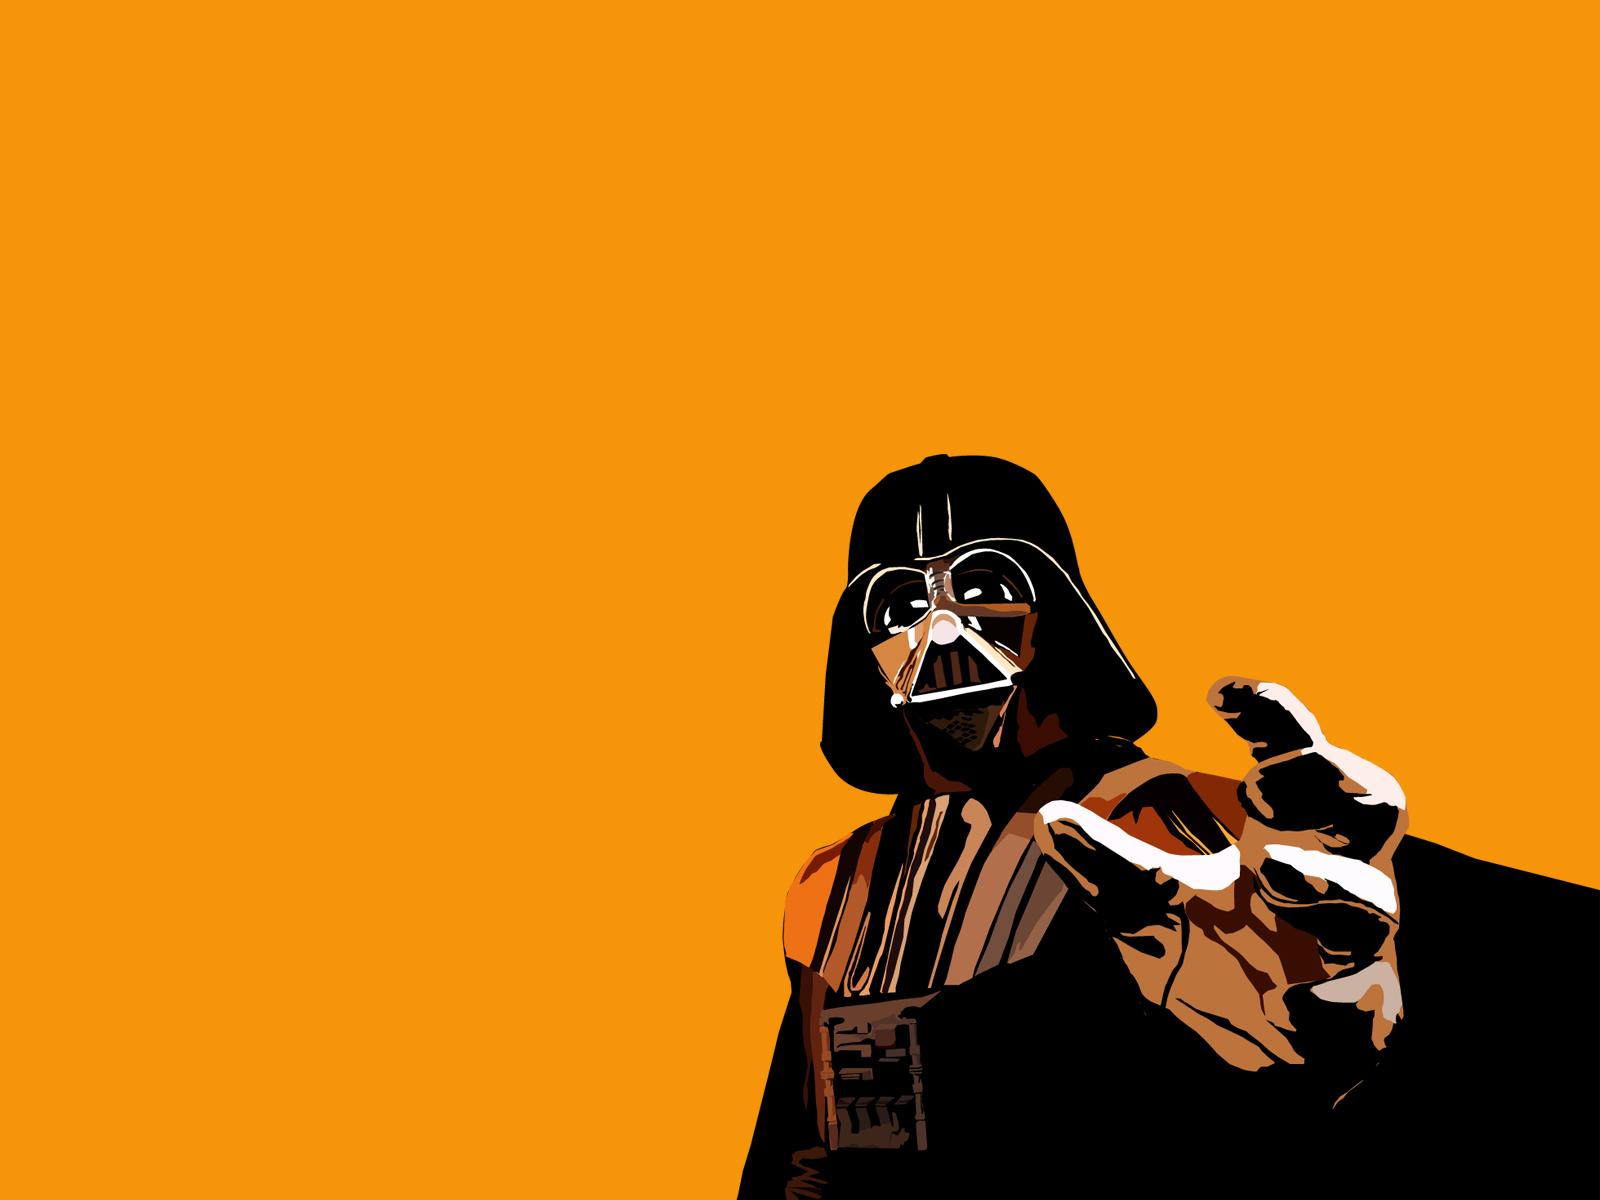 "Star Wars Å£ç´™ç""»åƒ Pchdwallpaper Com Pchdwallpaper Com"